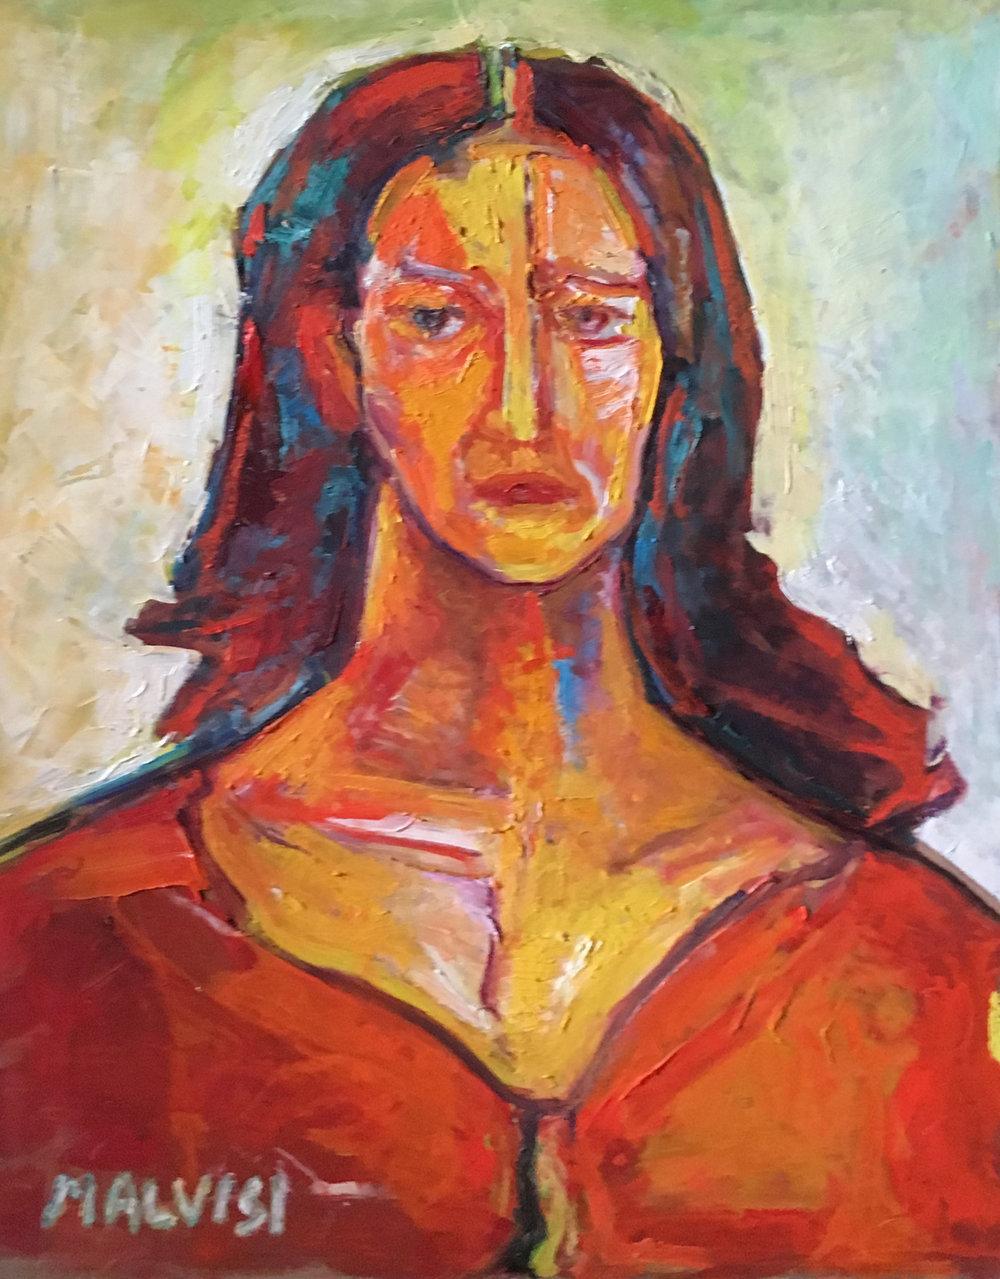 <b>Vittoria</b><br> 2002 Oil on wood <br> cm 50 x 70